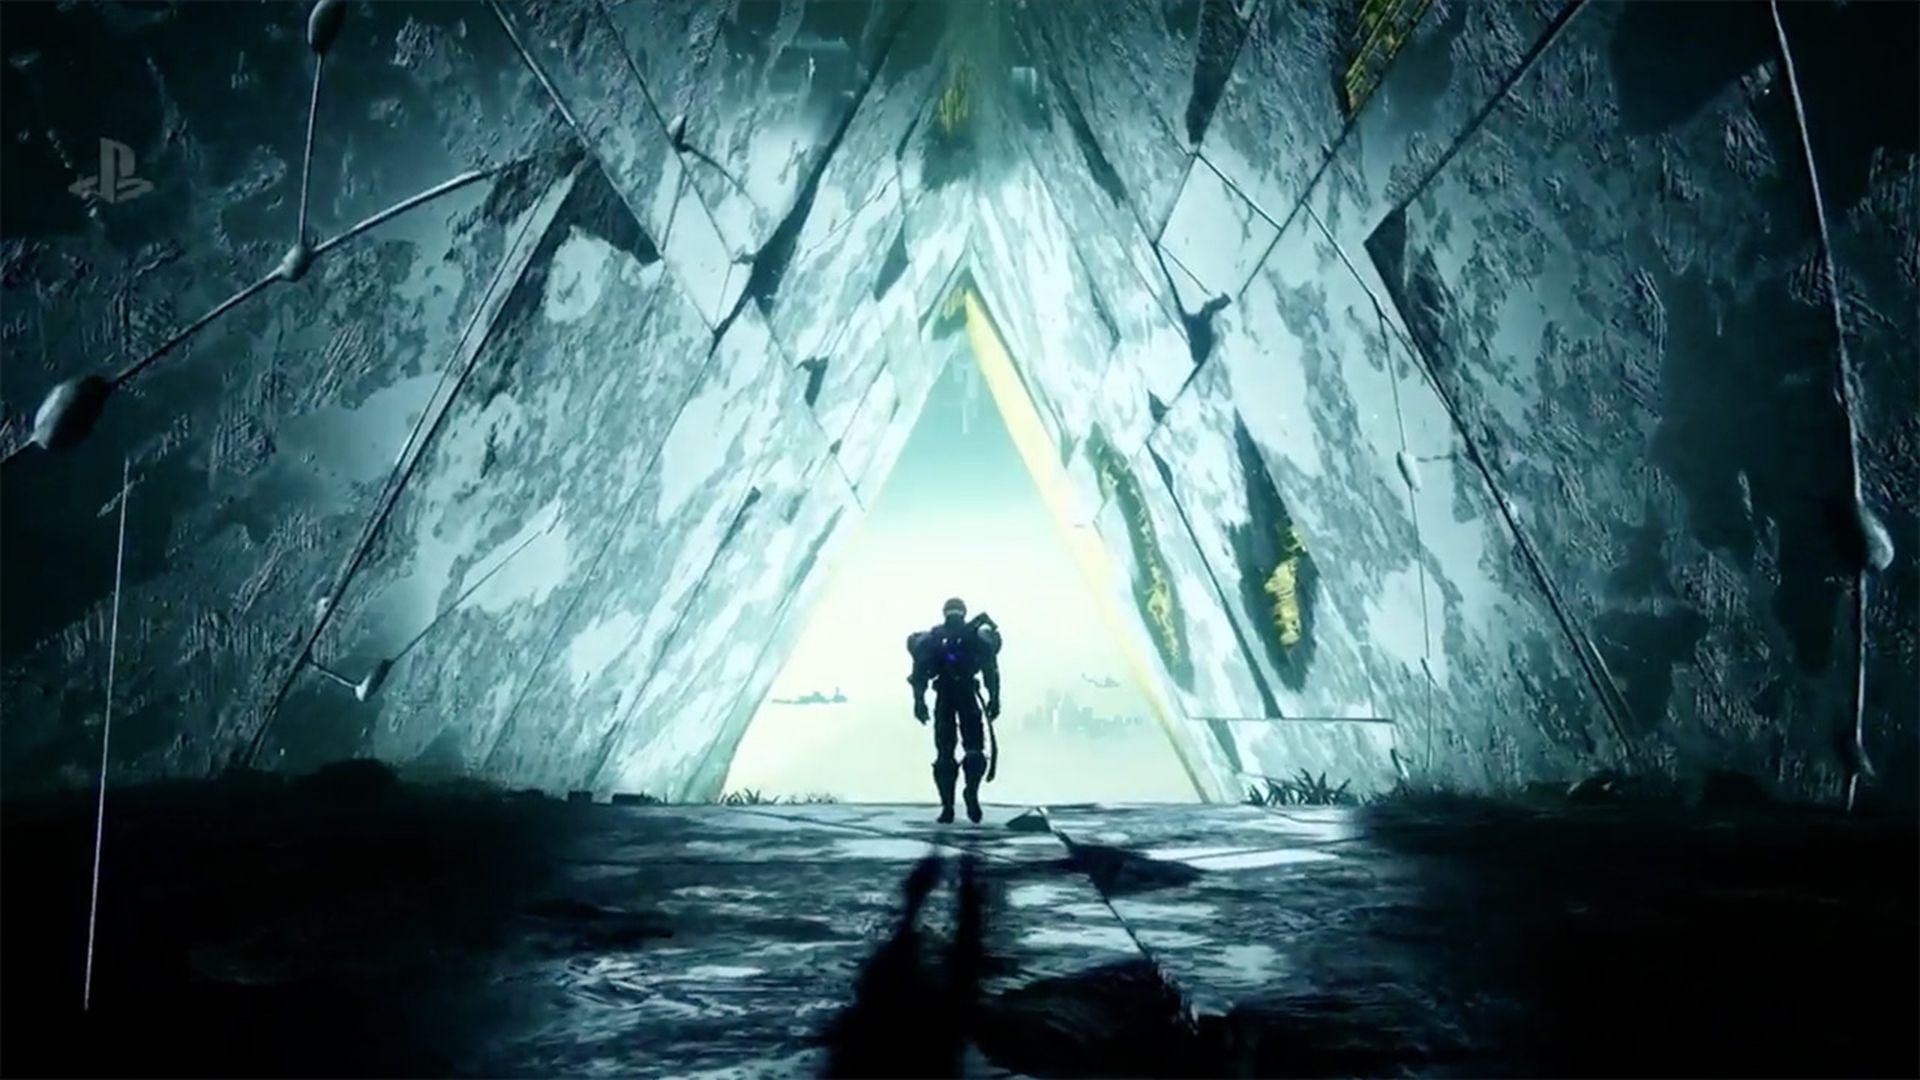 Destiny 2 Destiny Haunted Forest Destiny 2 Beyond Light